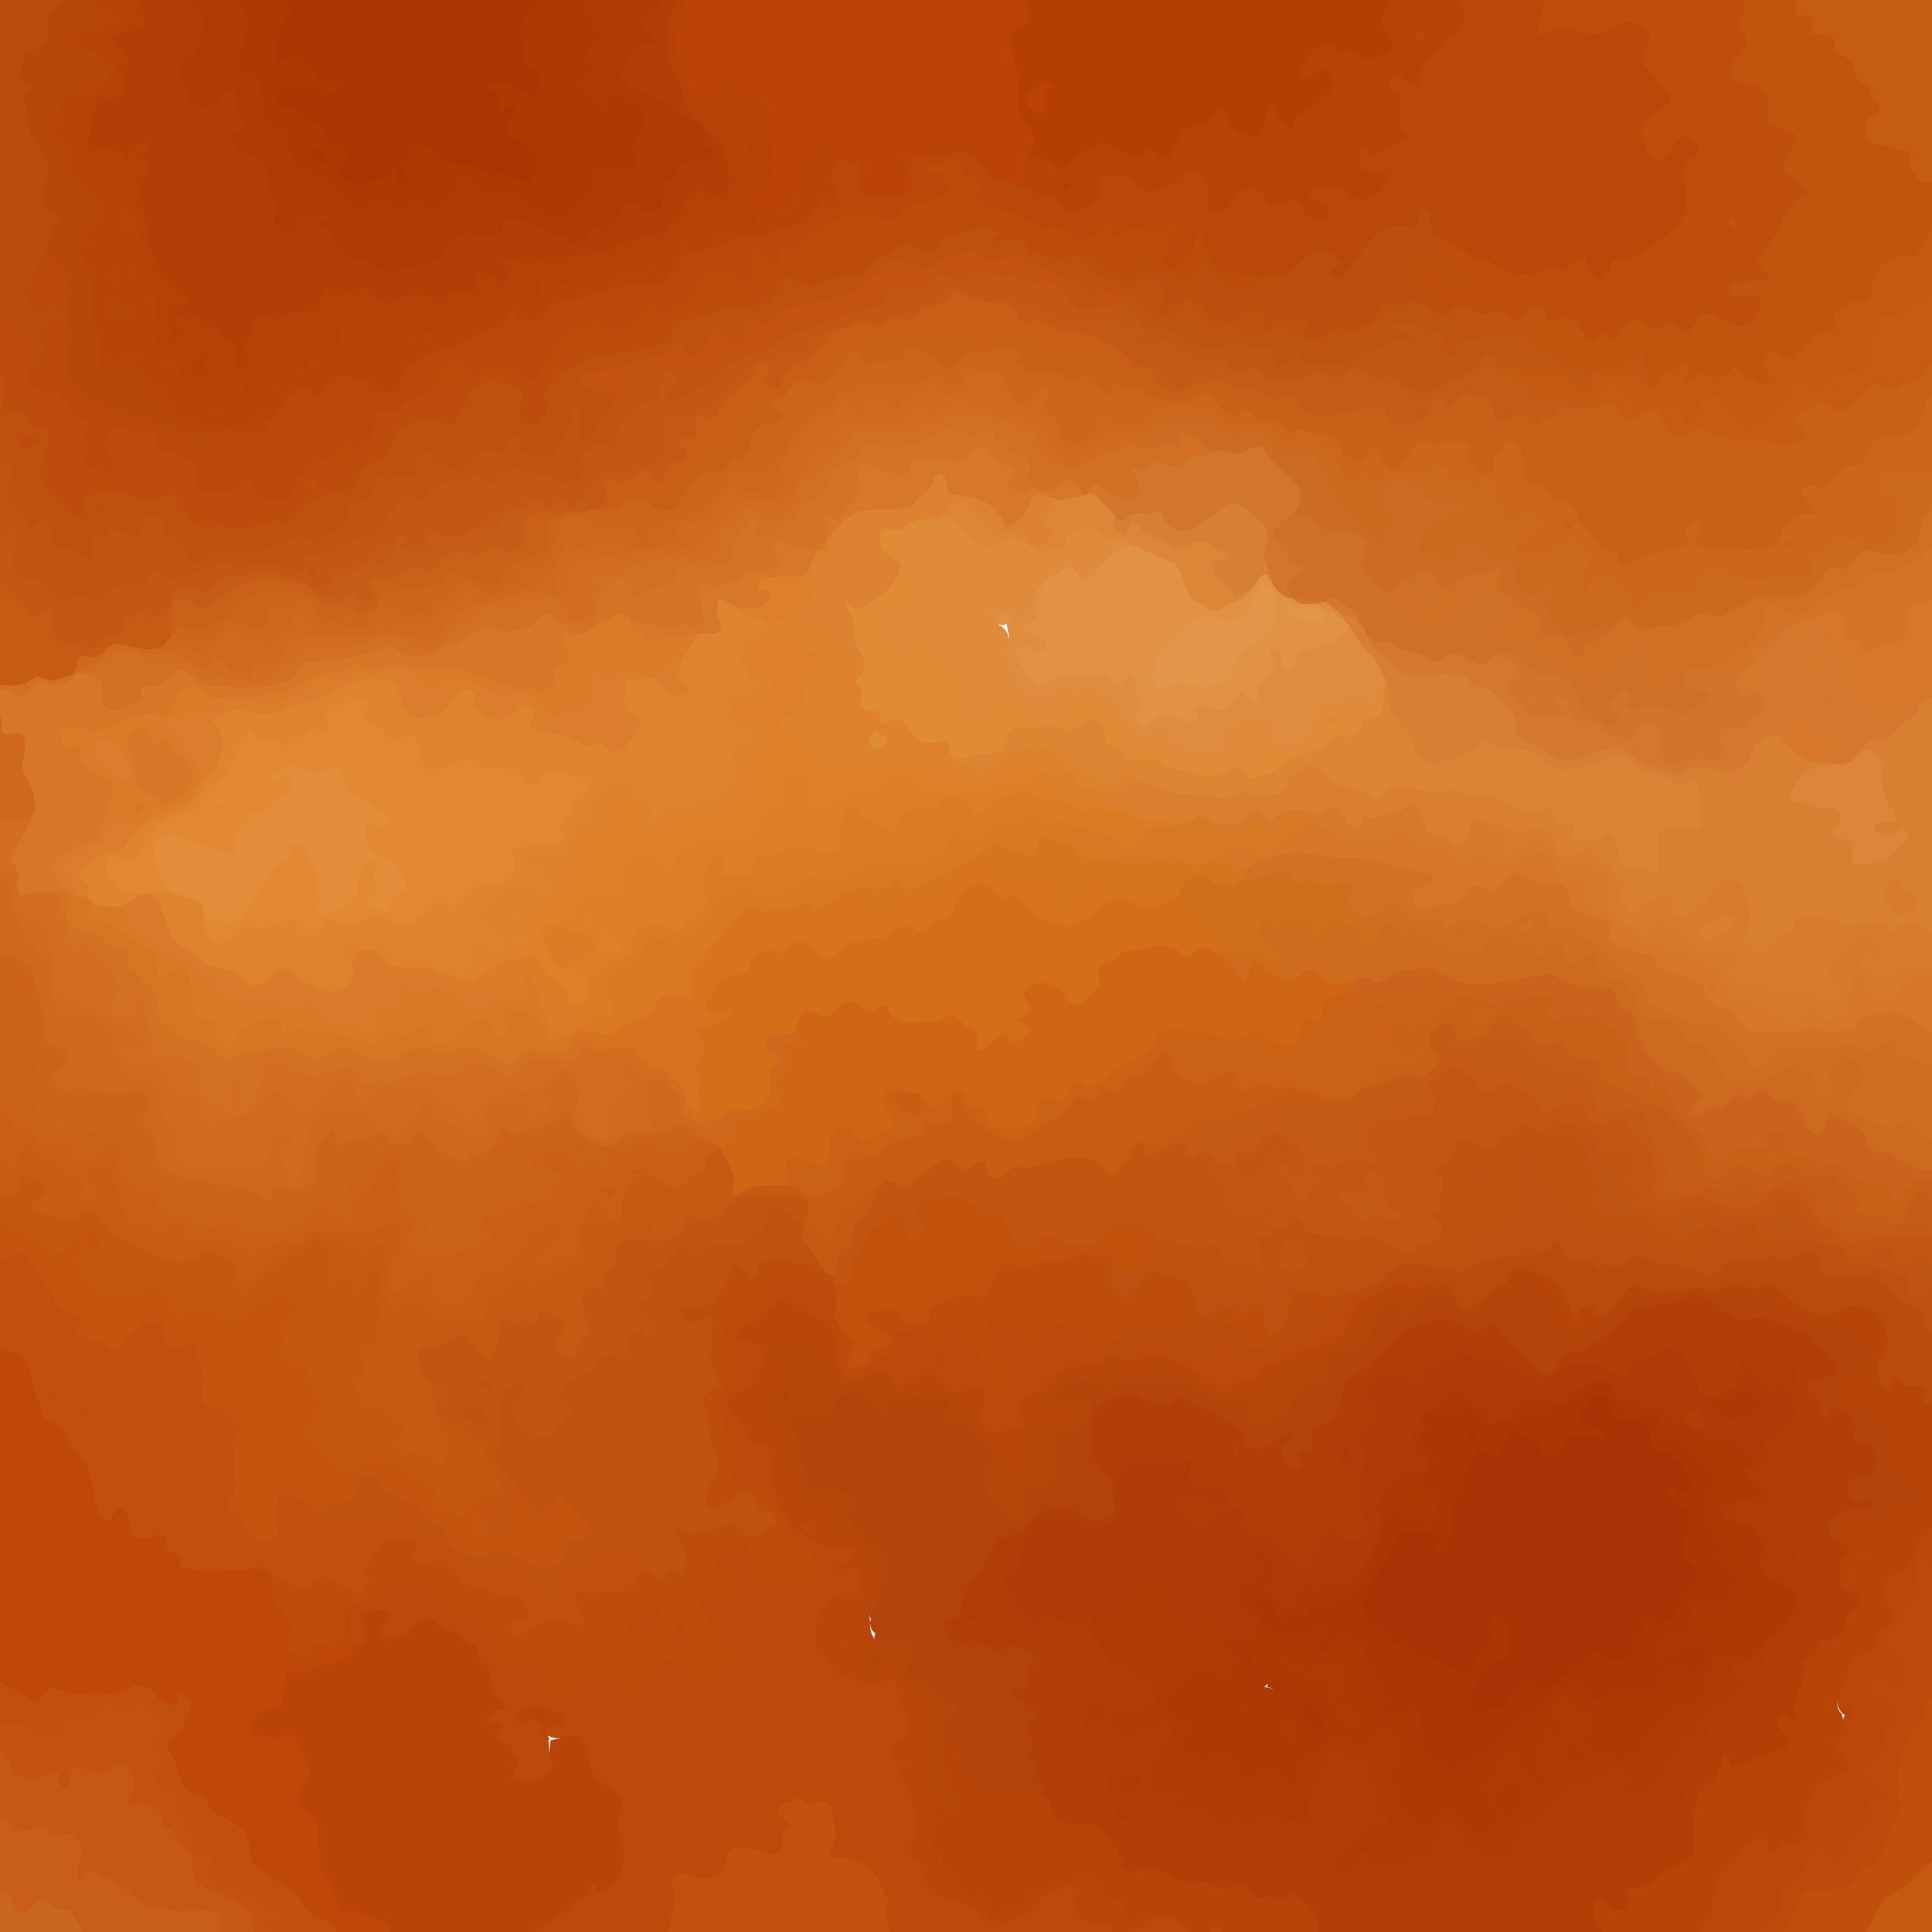 Watercolor Orange Abstract iPad Wallpaper